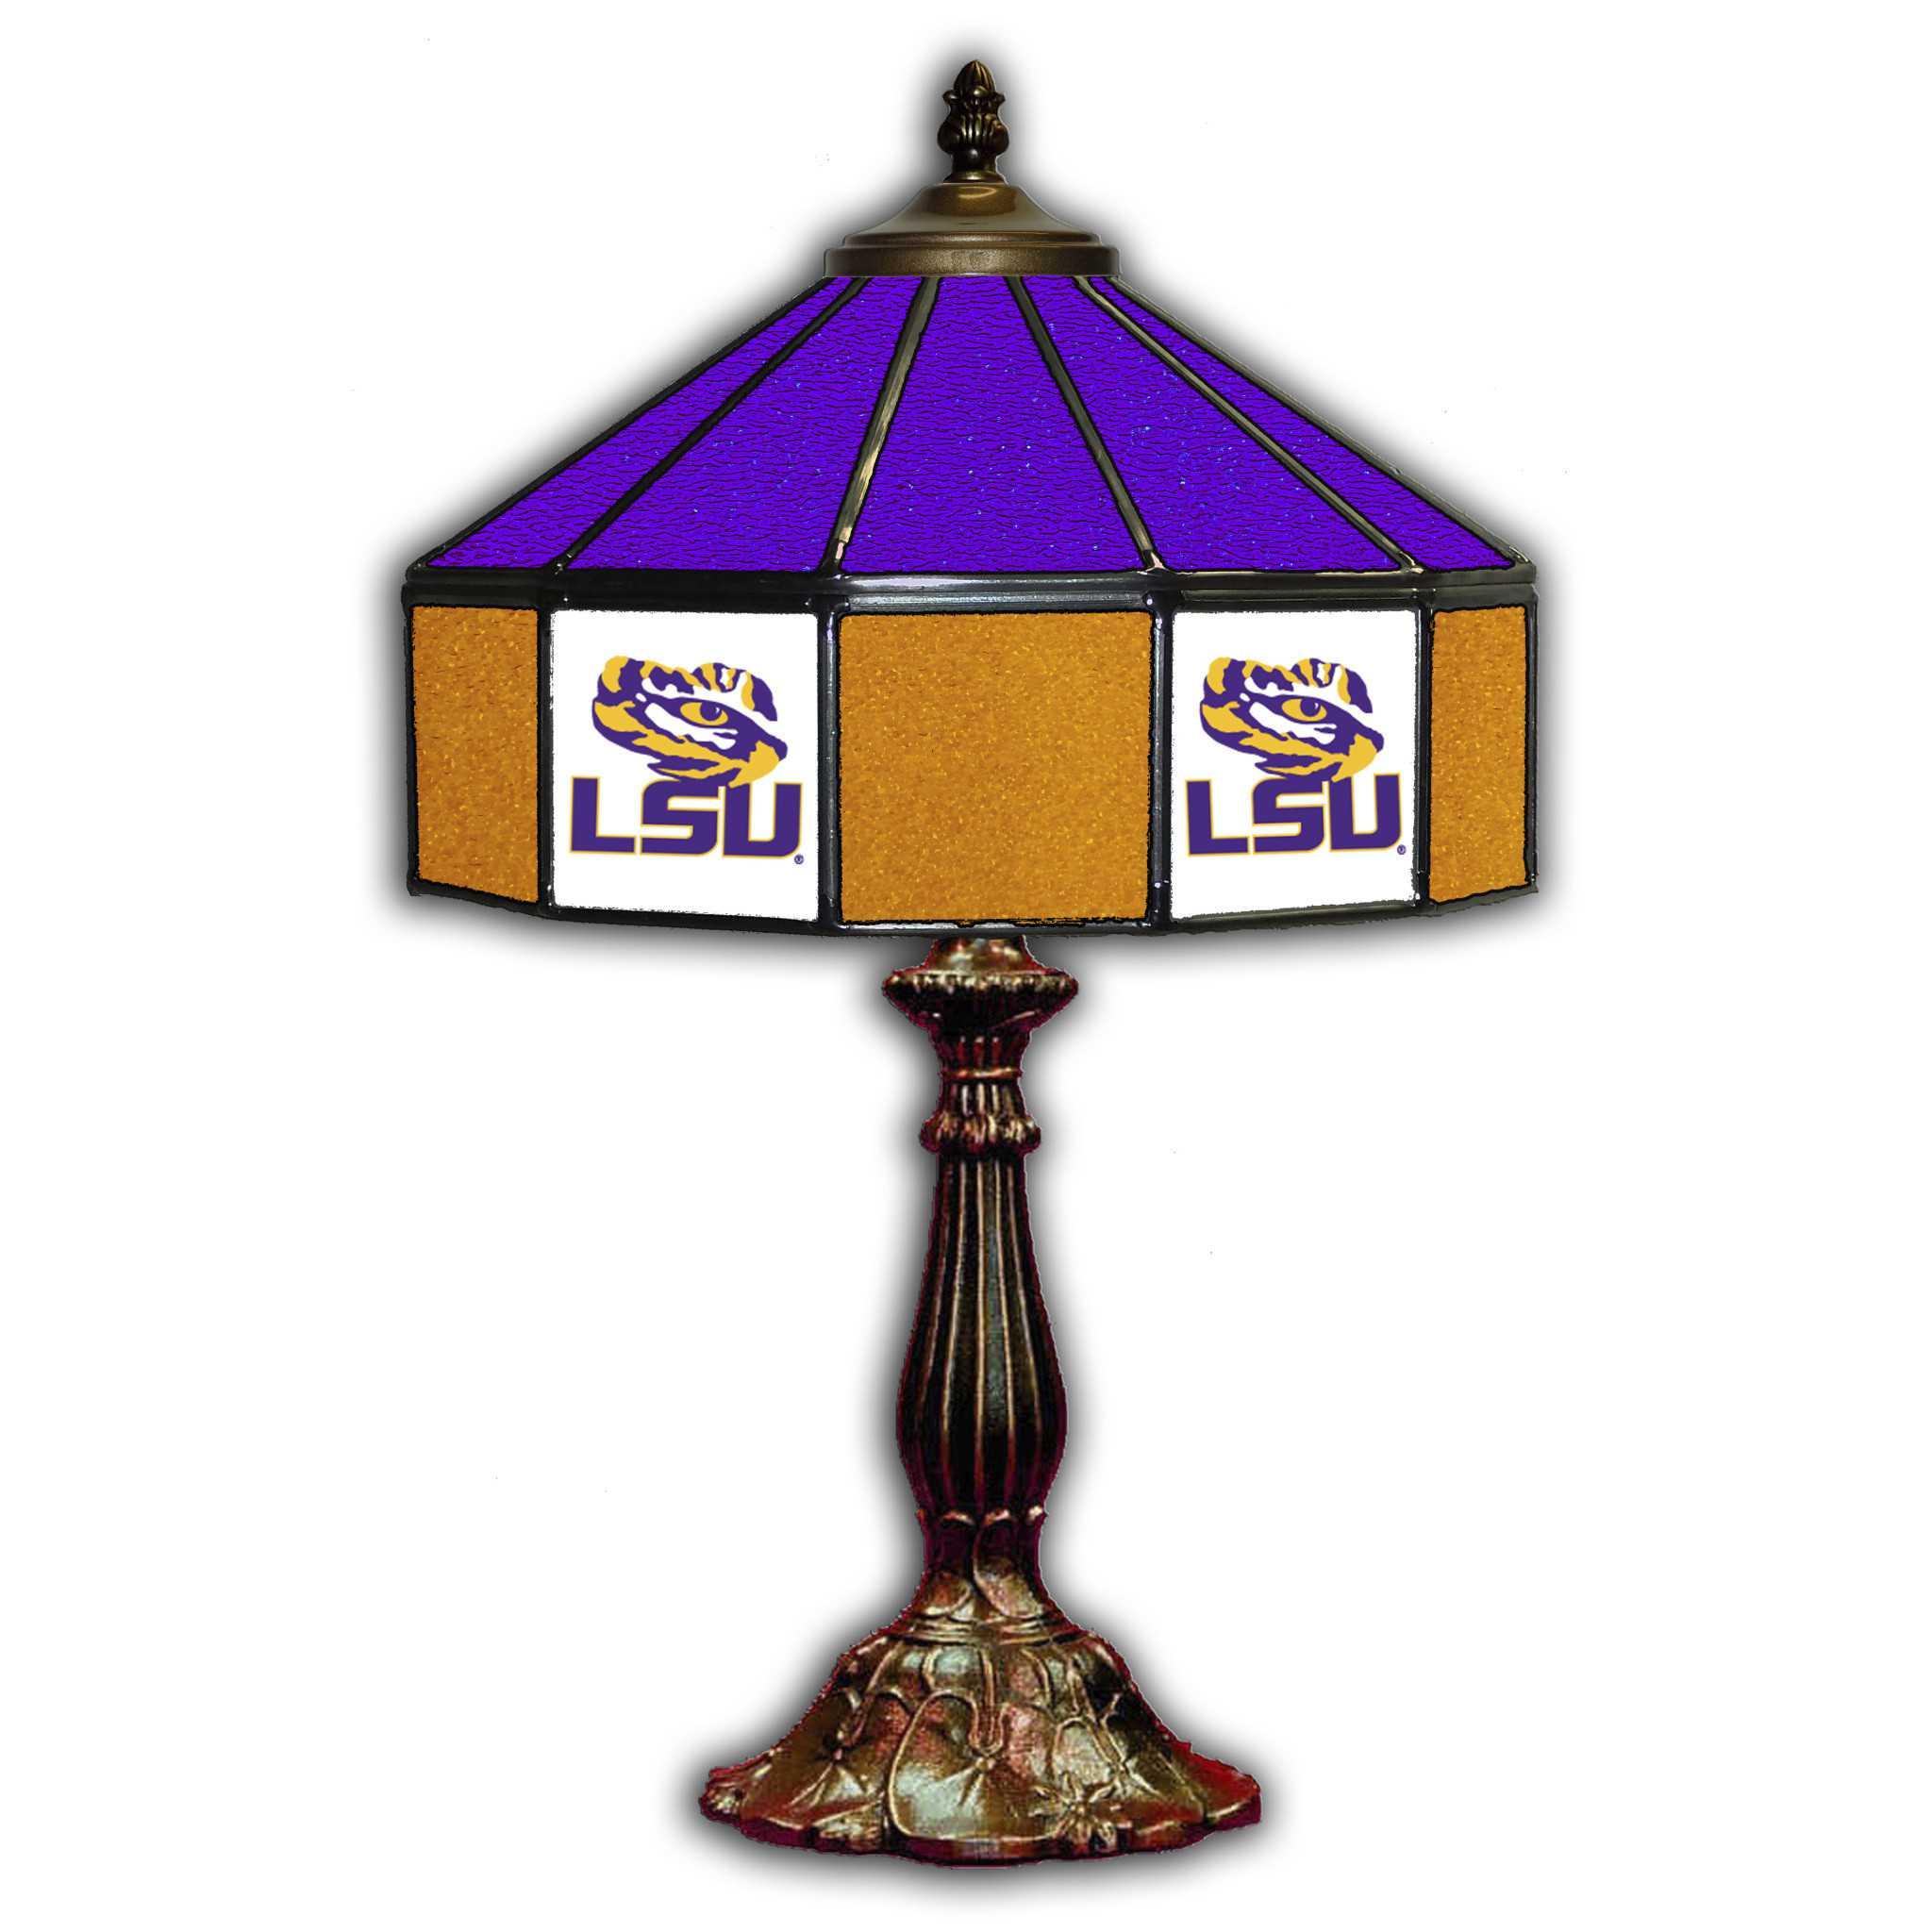 "LOUISIANA STATE UNIVERSITY 21"" GLASS TABLE LAMP"